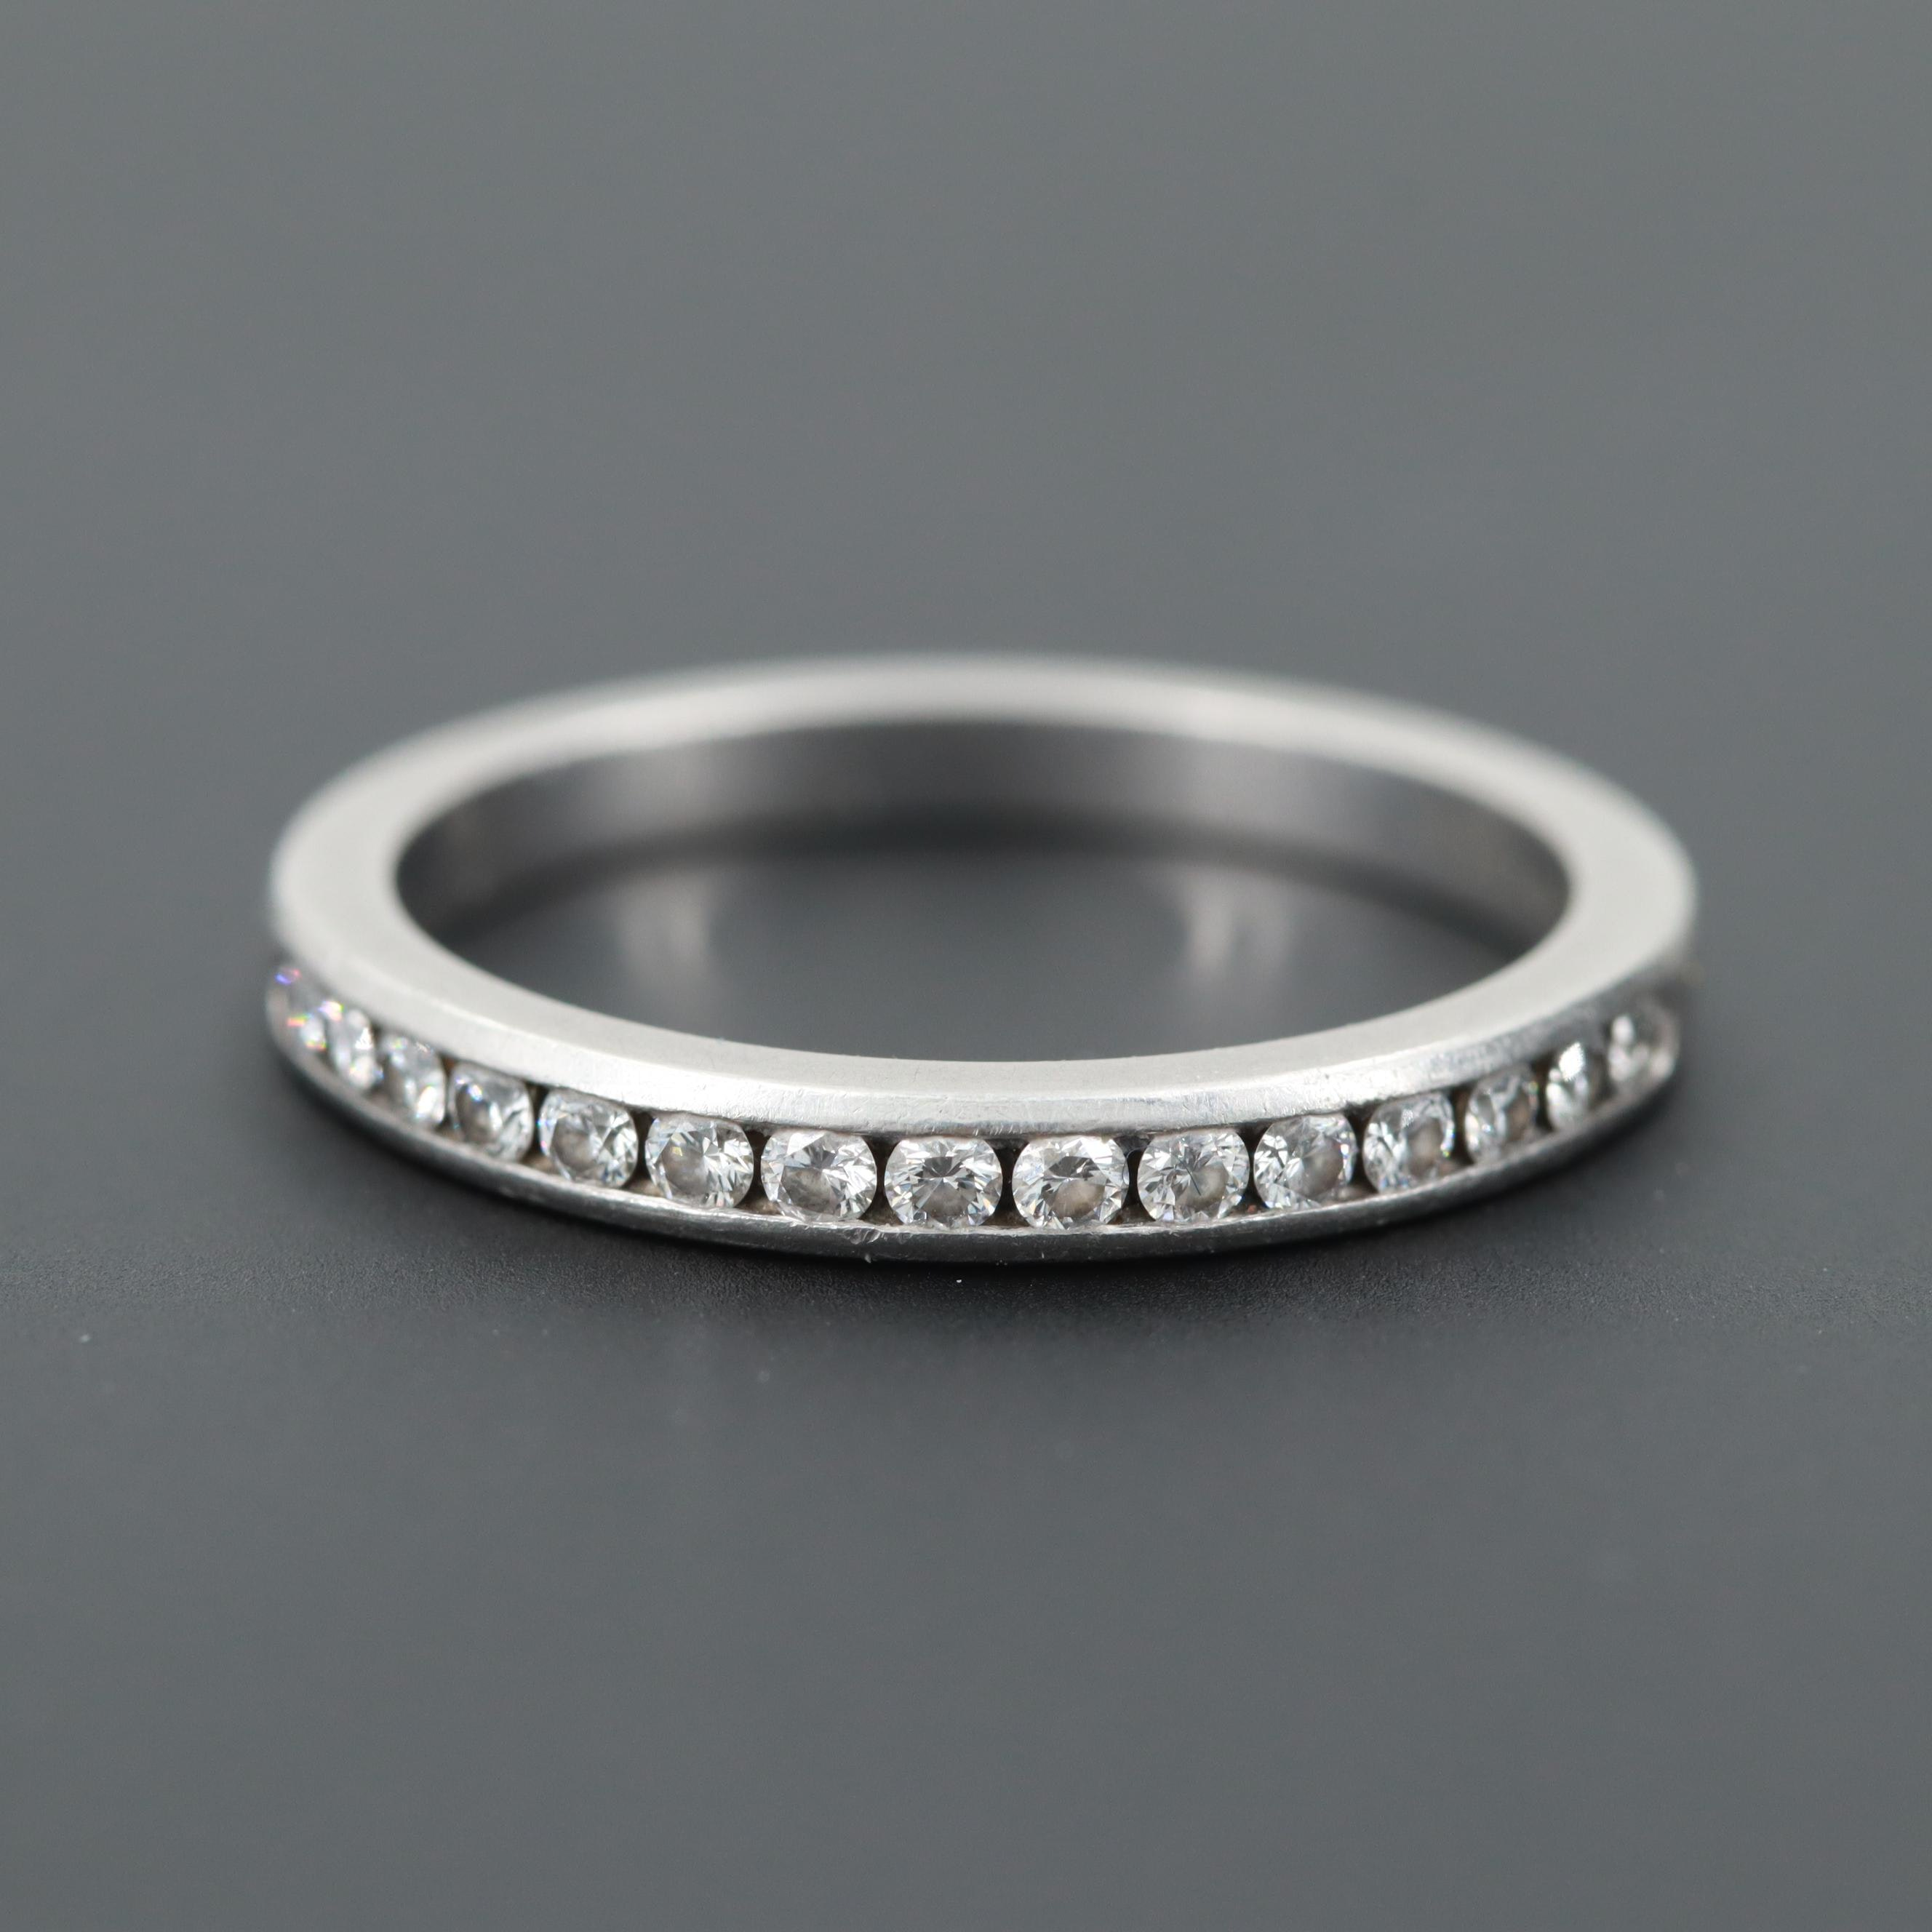 "Tiffany & Co Platinum Diamond ""Half Circle Eternity"" Ring with Box"